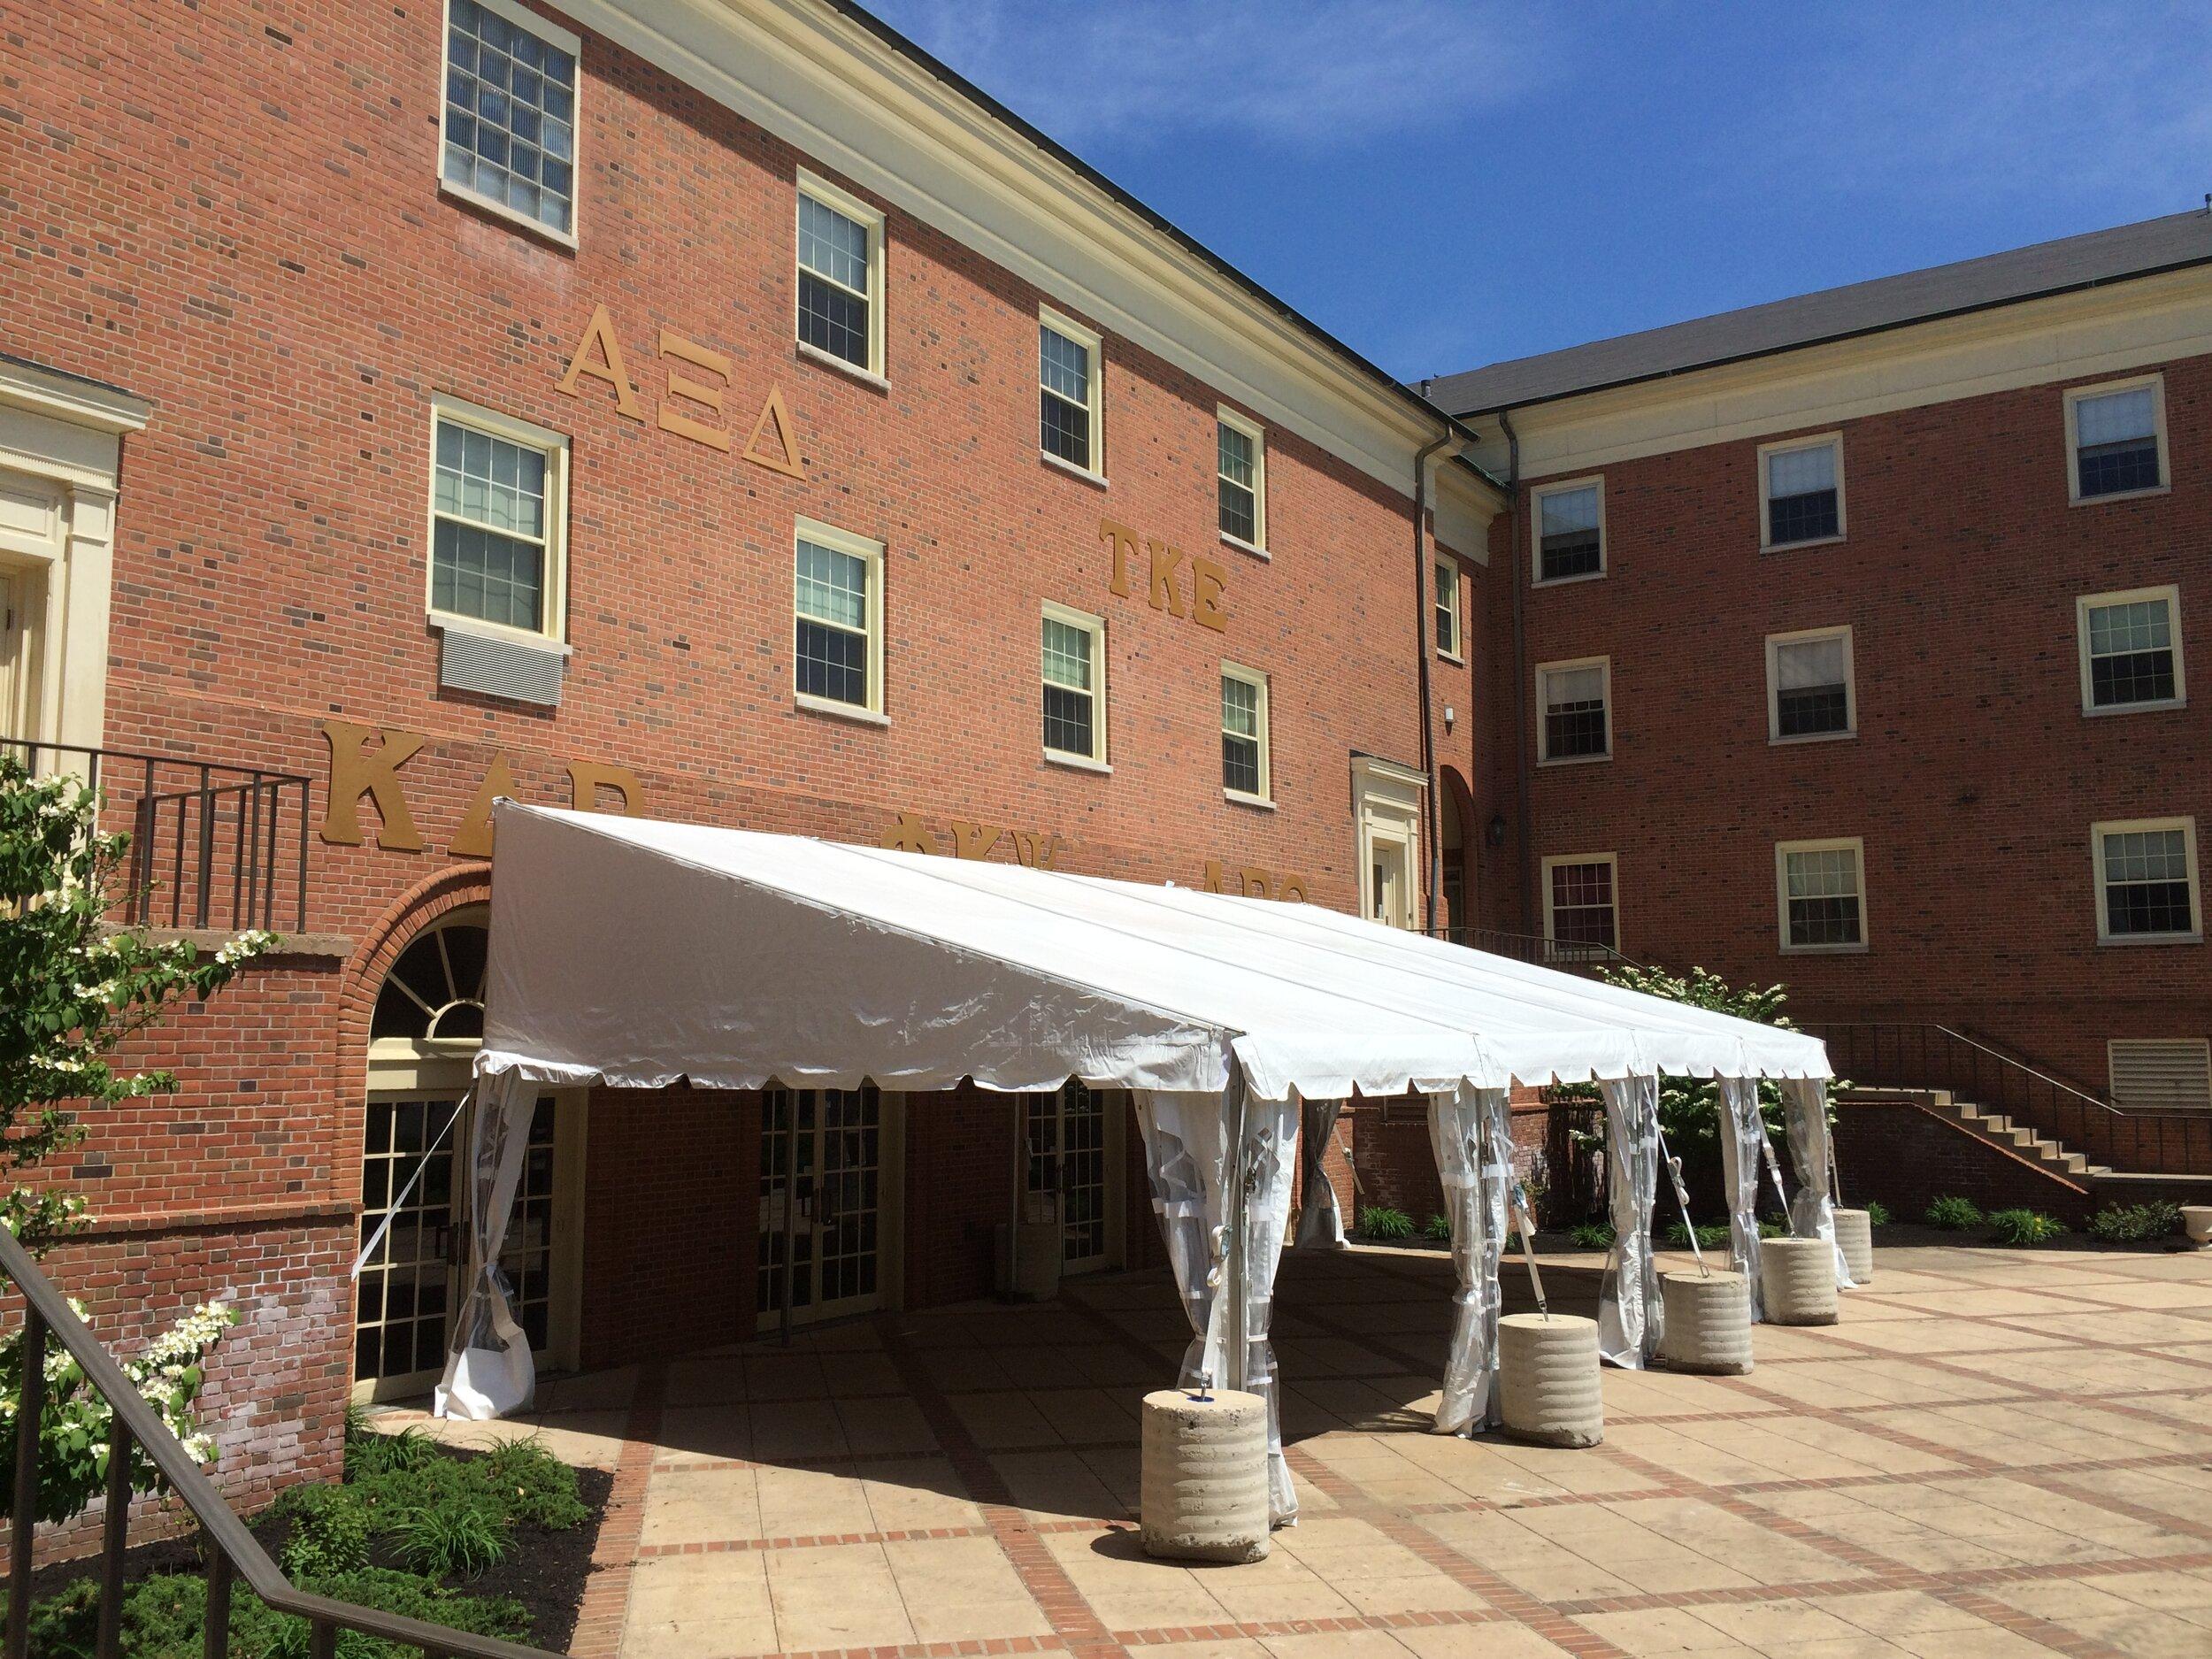 University tent service